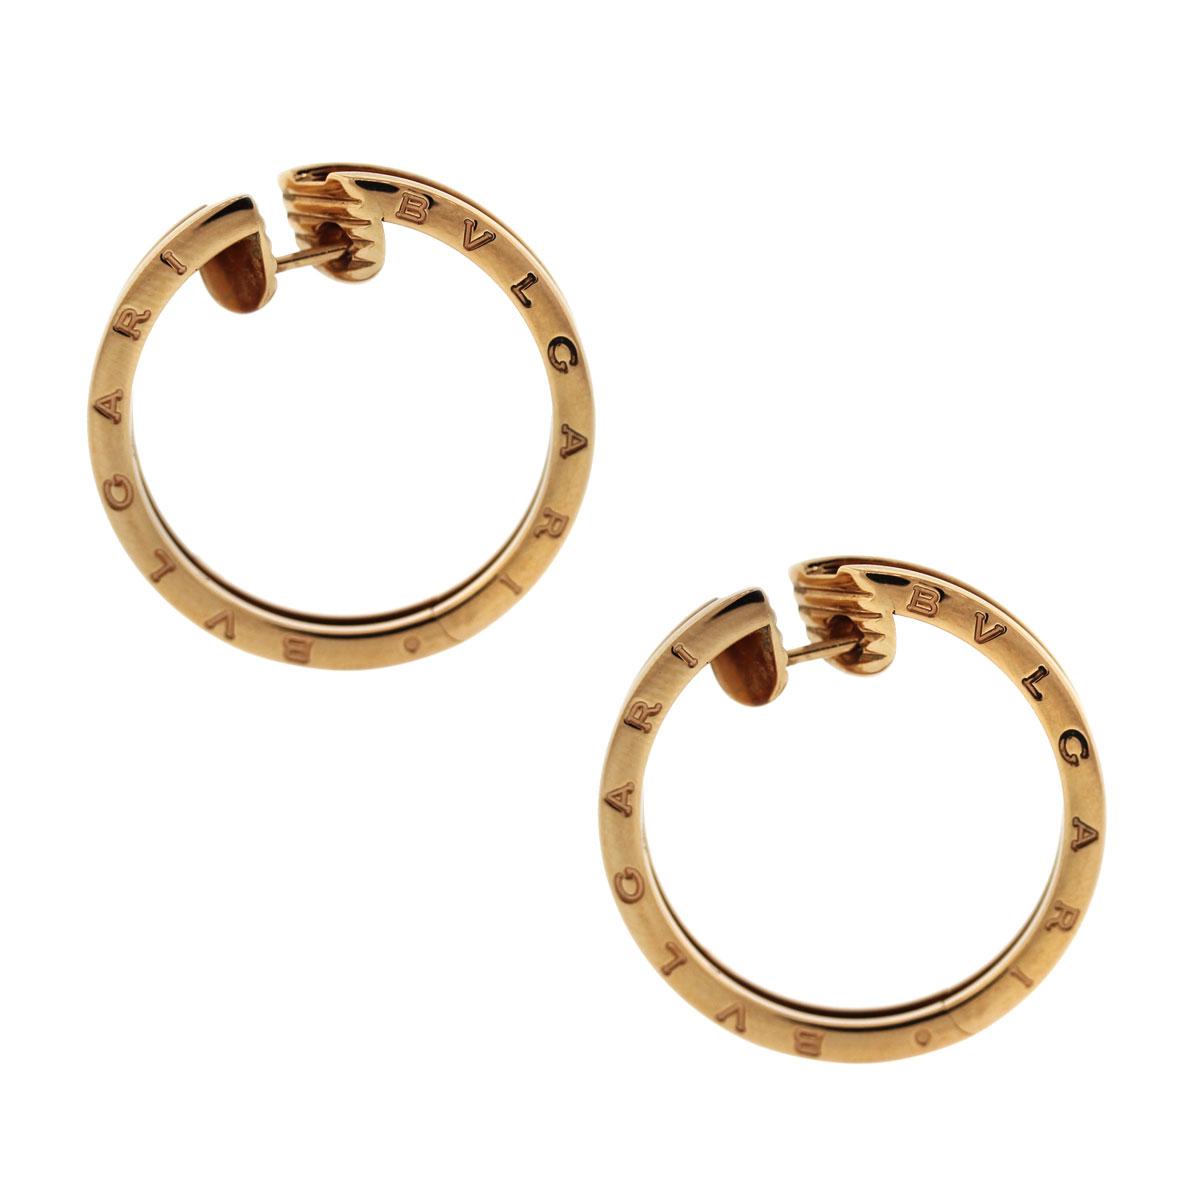 Bvlgari 18k Rose Gold Large B.Zero1 Hoop Earrings